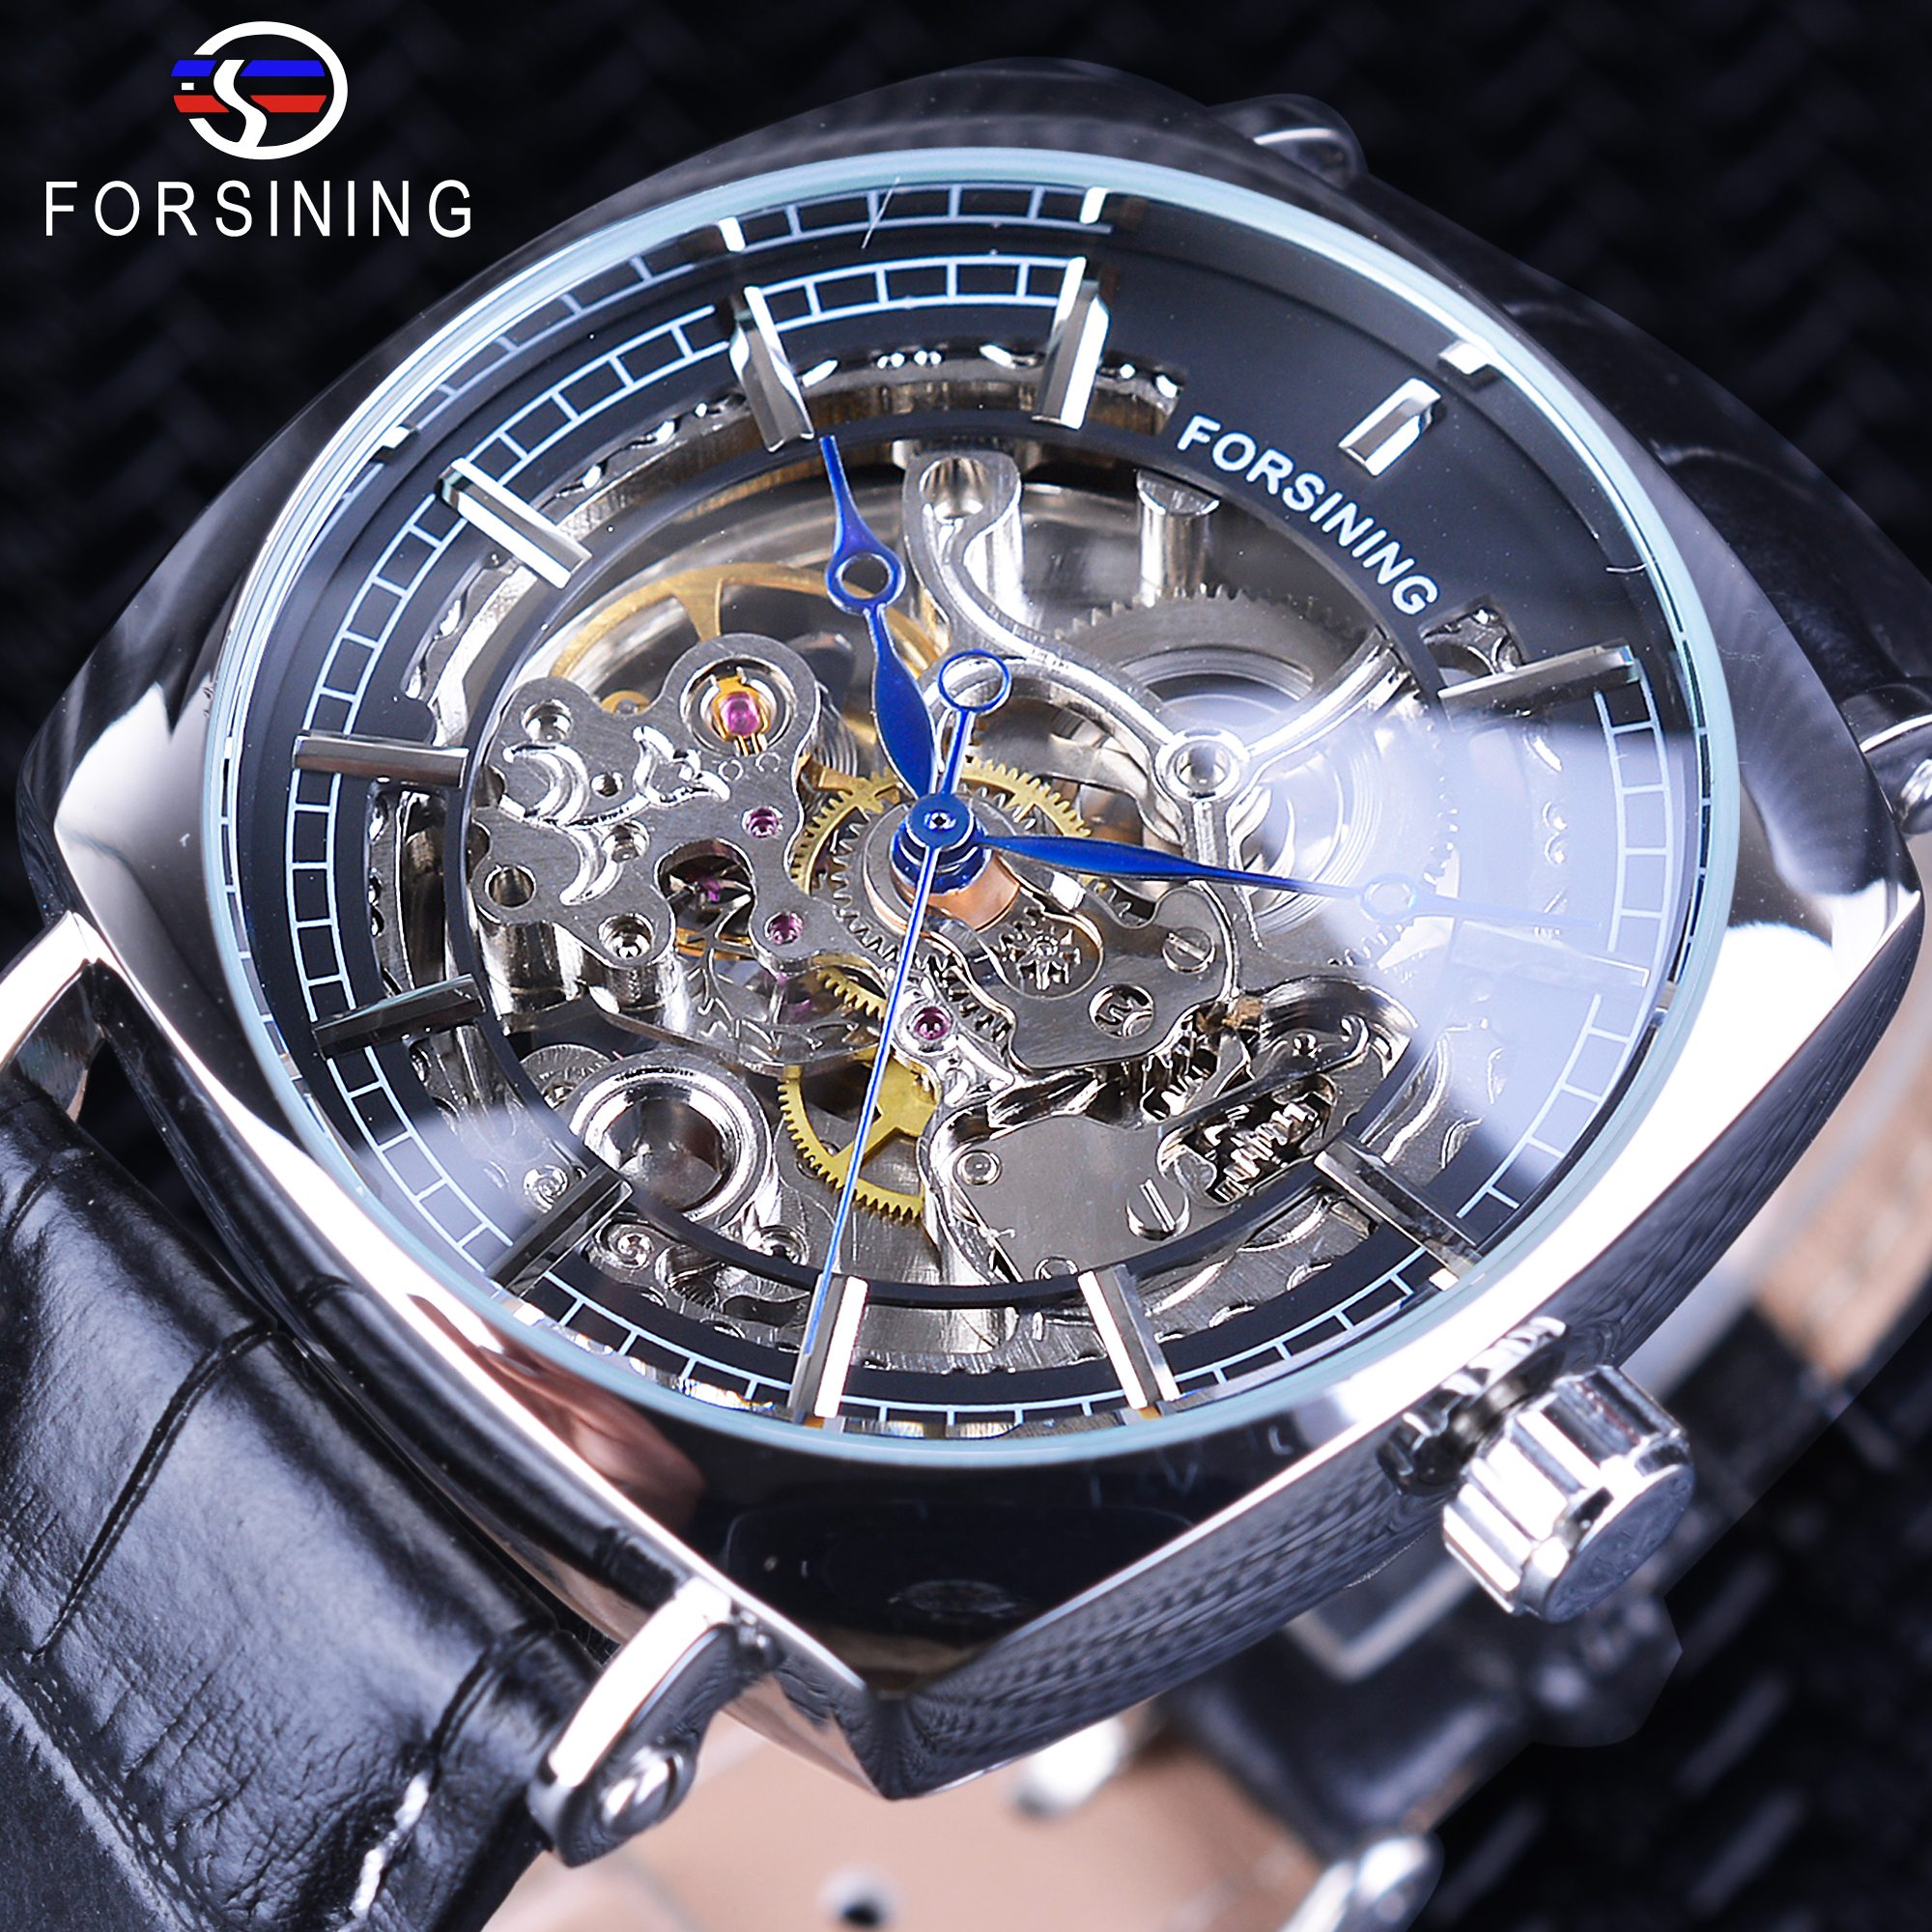 Forsining New Fashion Argento Caso di Scheletro Piazza Dial Black Leather  Belt Uomo Meccanico Automatico Orologi Impermeabile Orologio Maschile in  Forsining ... 252b266bac11